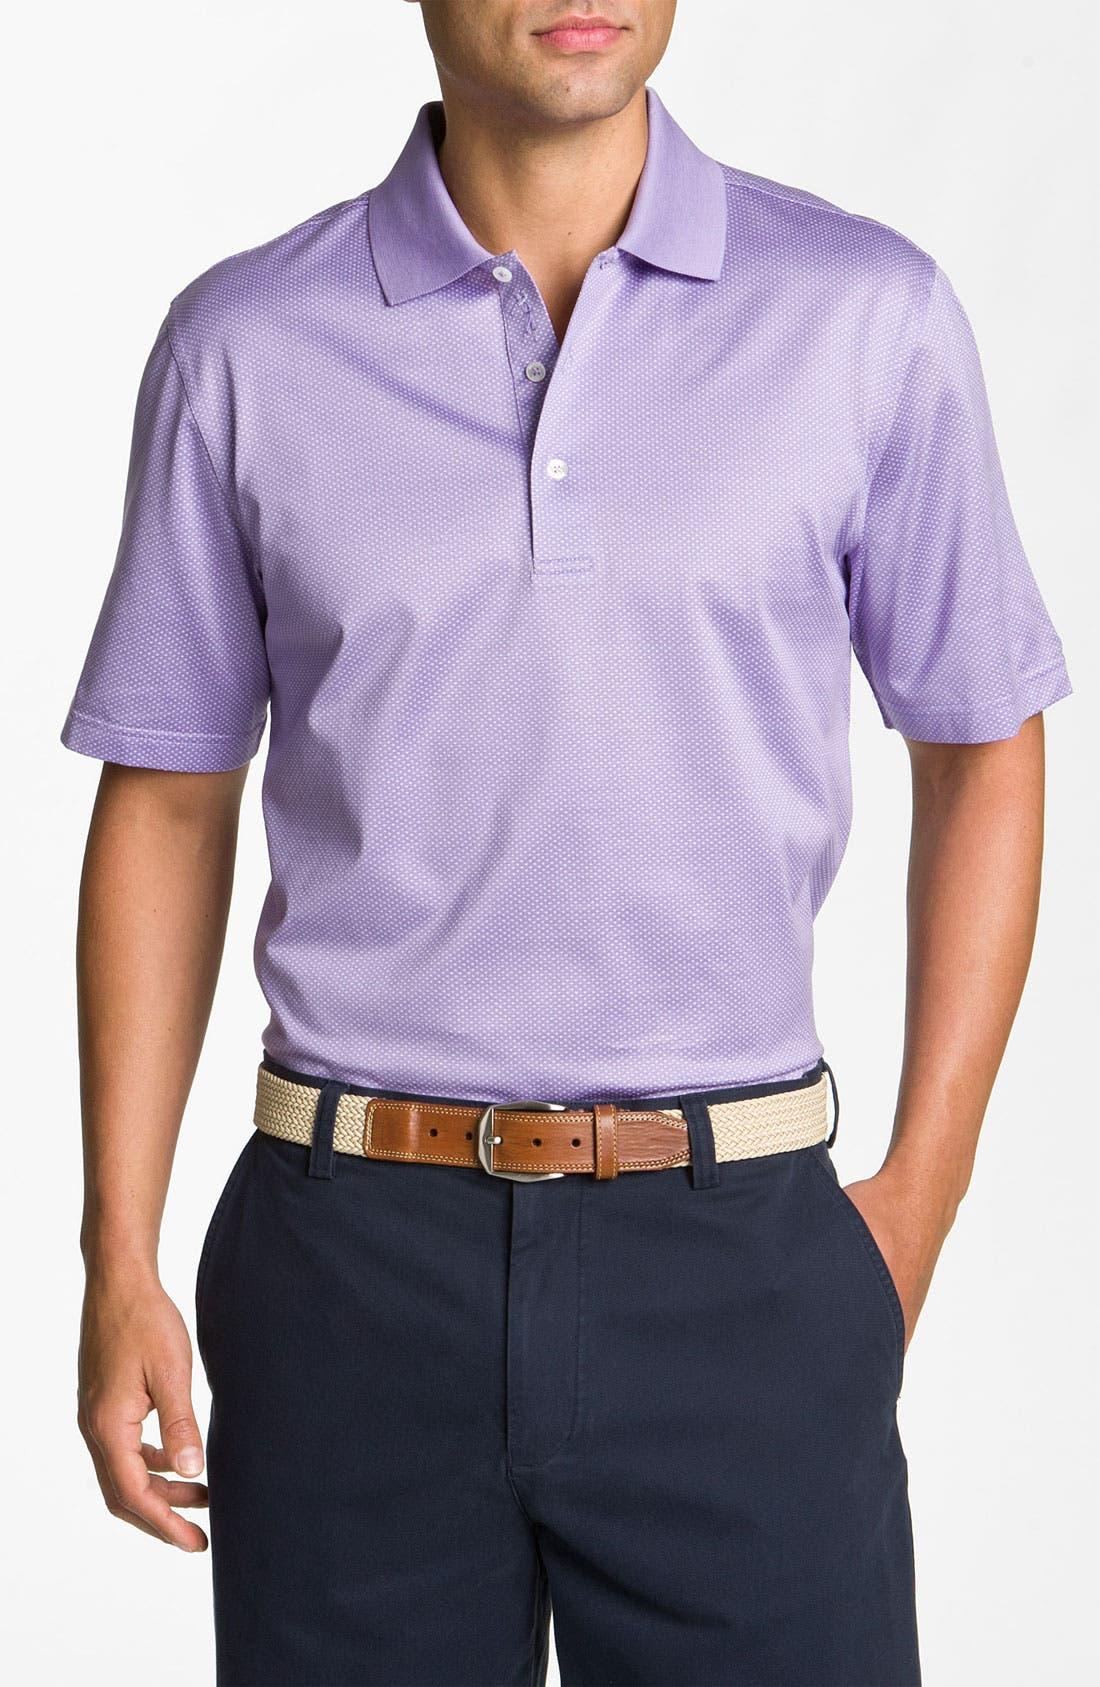 Main Image - Bobby Jones 'Dash' Jacquard Golf Polo